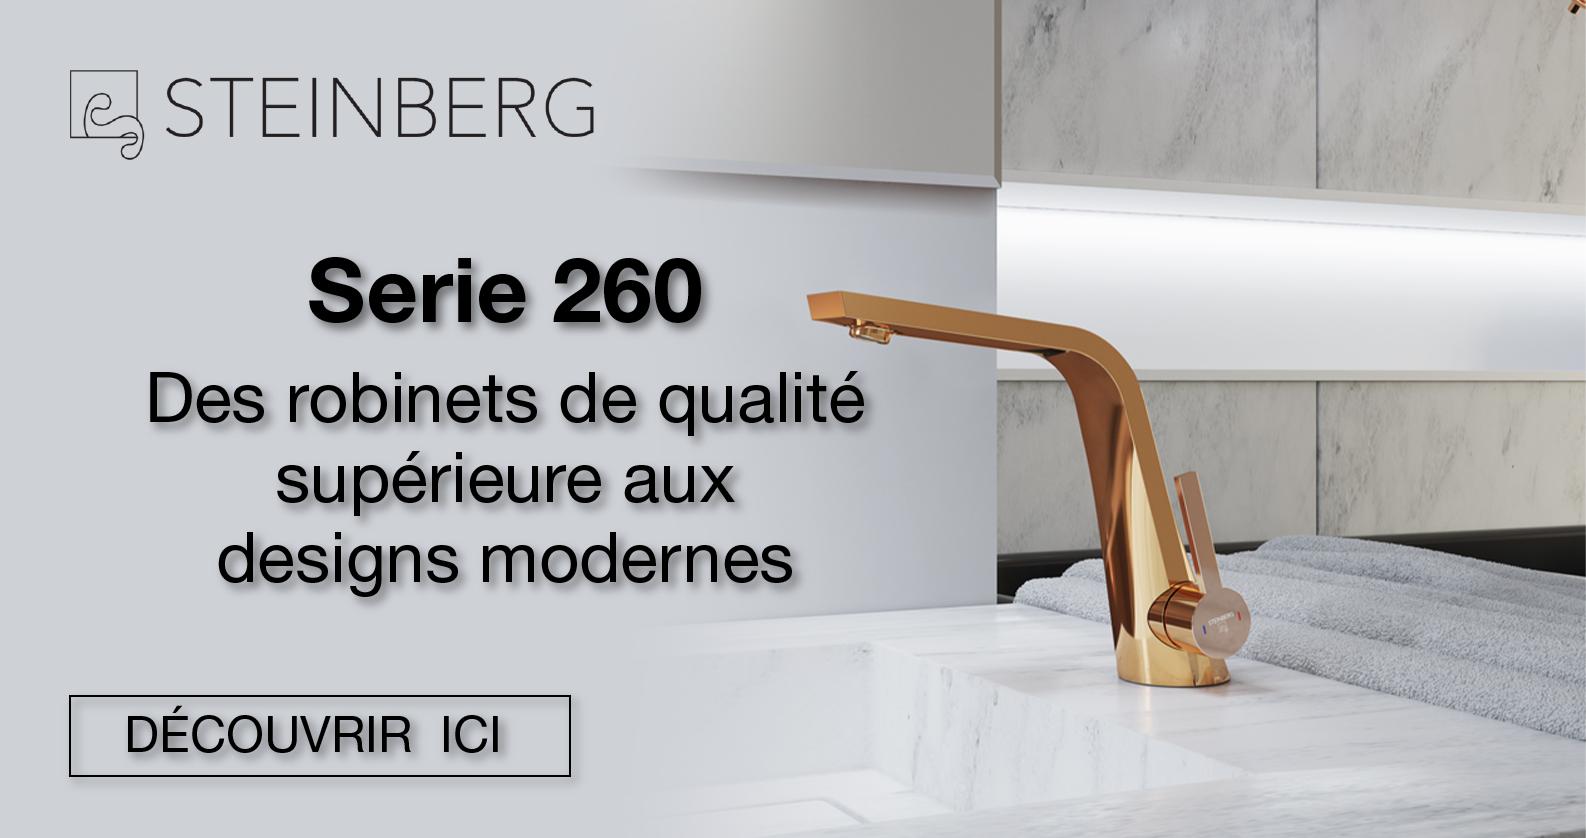 Steinberg Serie 260 chez xTWOstore